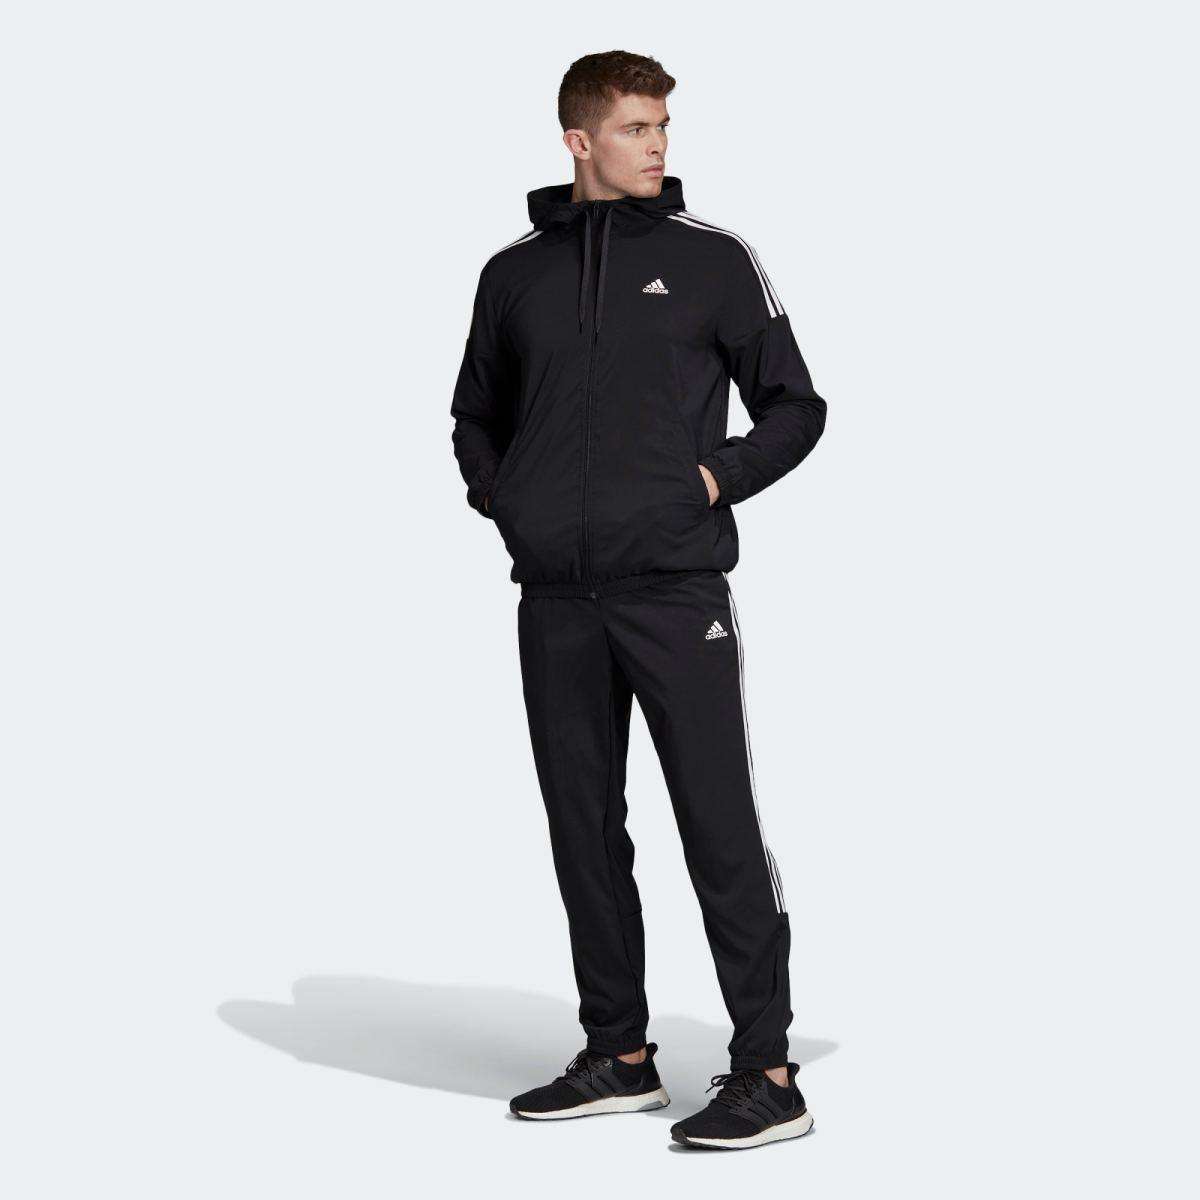 Track_Suit_Black_EB7651_21_model